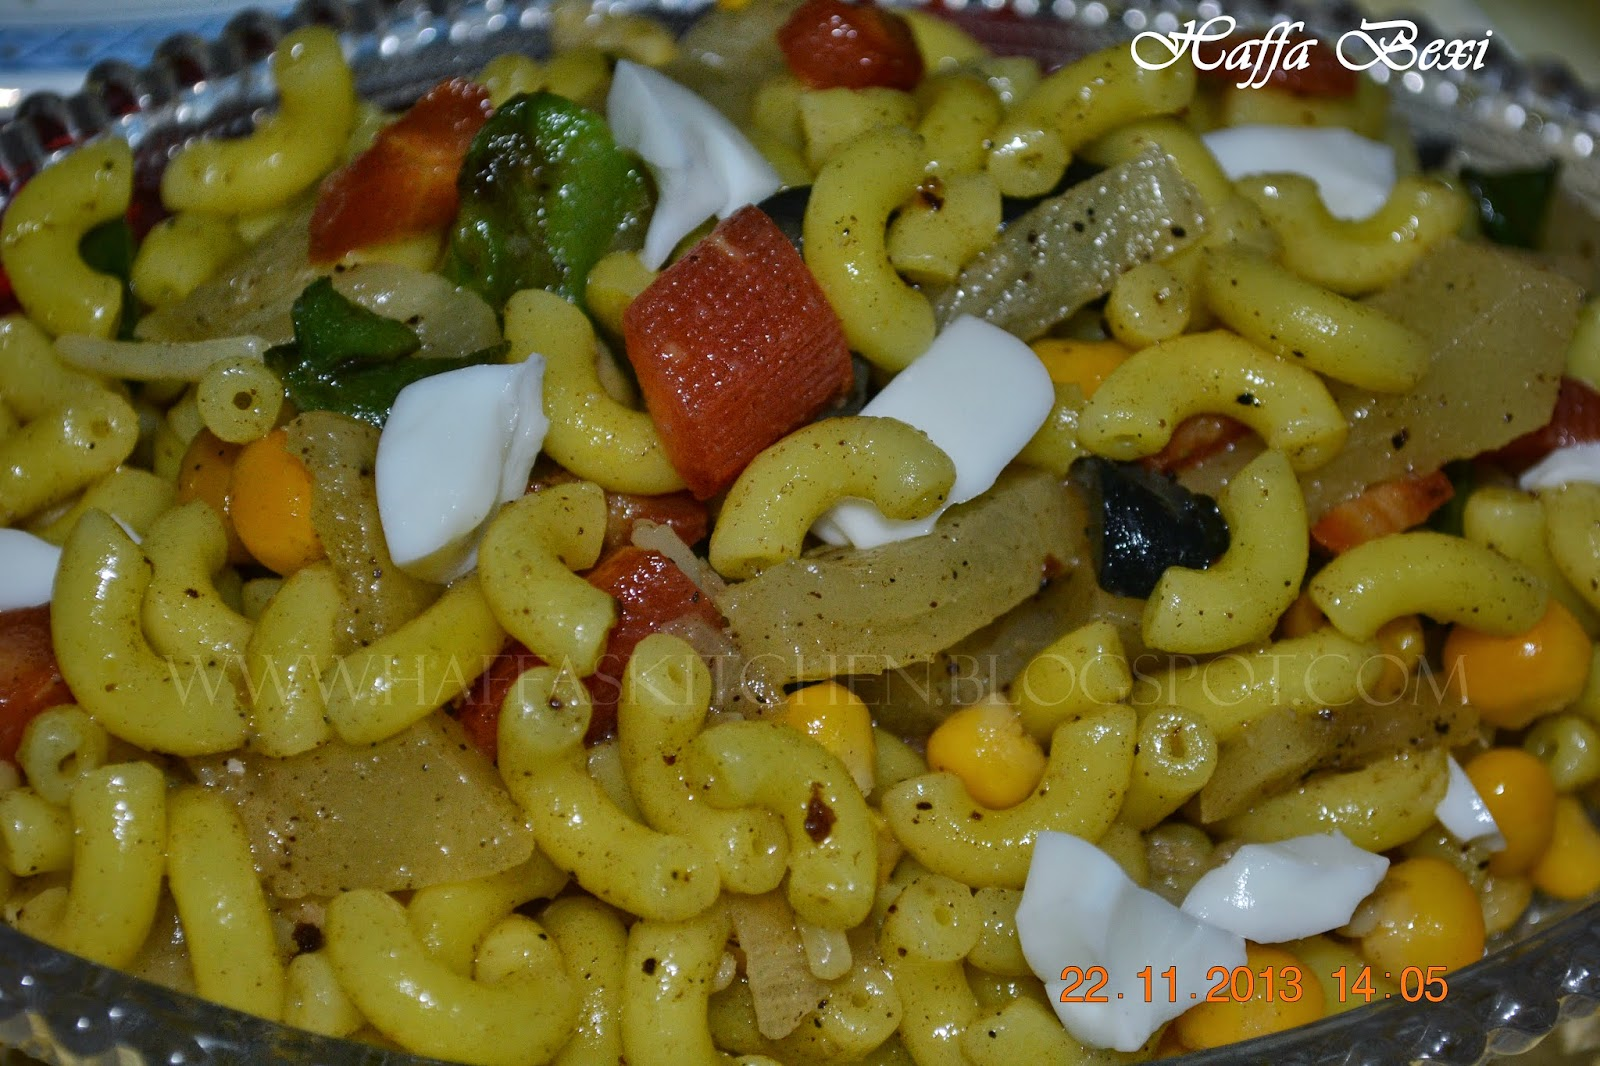 salads, salads recipes, pasta pineapple salad, Pasta & Spaghetti, pasta salad recipe, pasta salad recipes, how to make pasta salad, easy pasta salad, recipe for pasta salad, easy pasta salad recipe